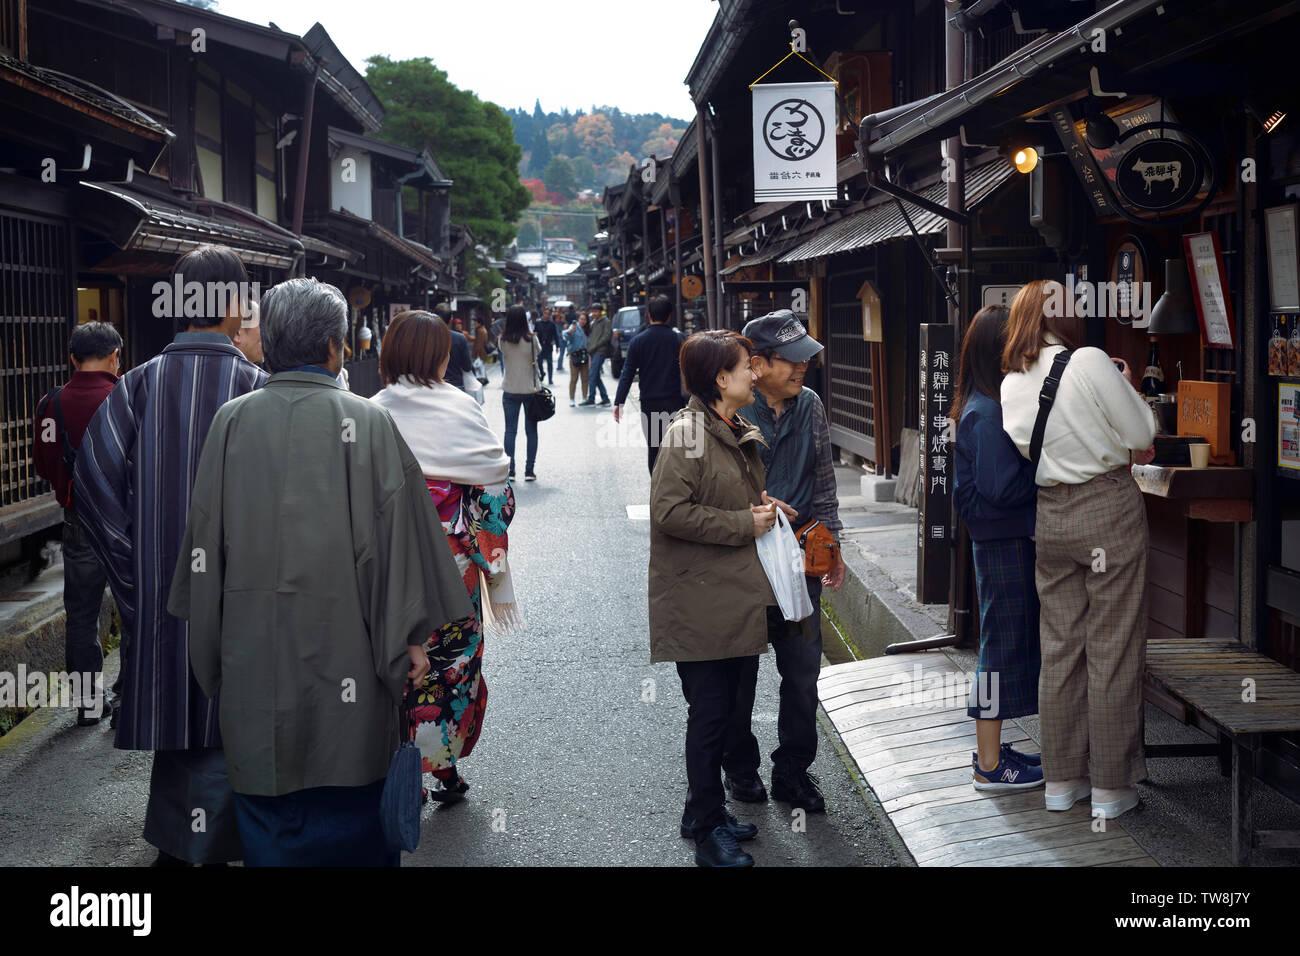 Busy with tourists old town market street of Takayama city. Kamisannomachi merchant town lined with shops and restaurants. Hida-Takayama, Gifu prefect - Stock Image